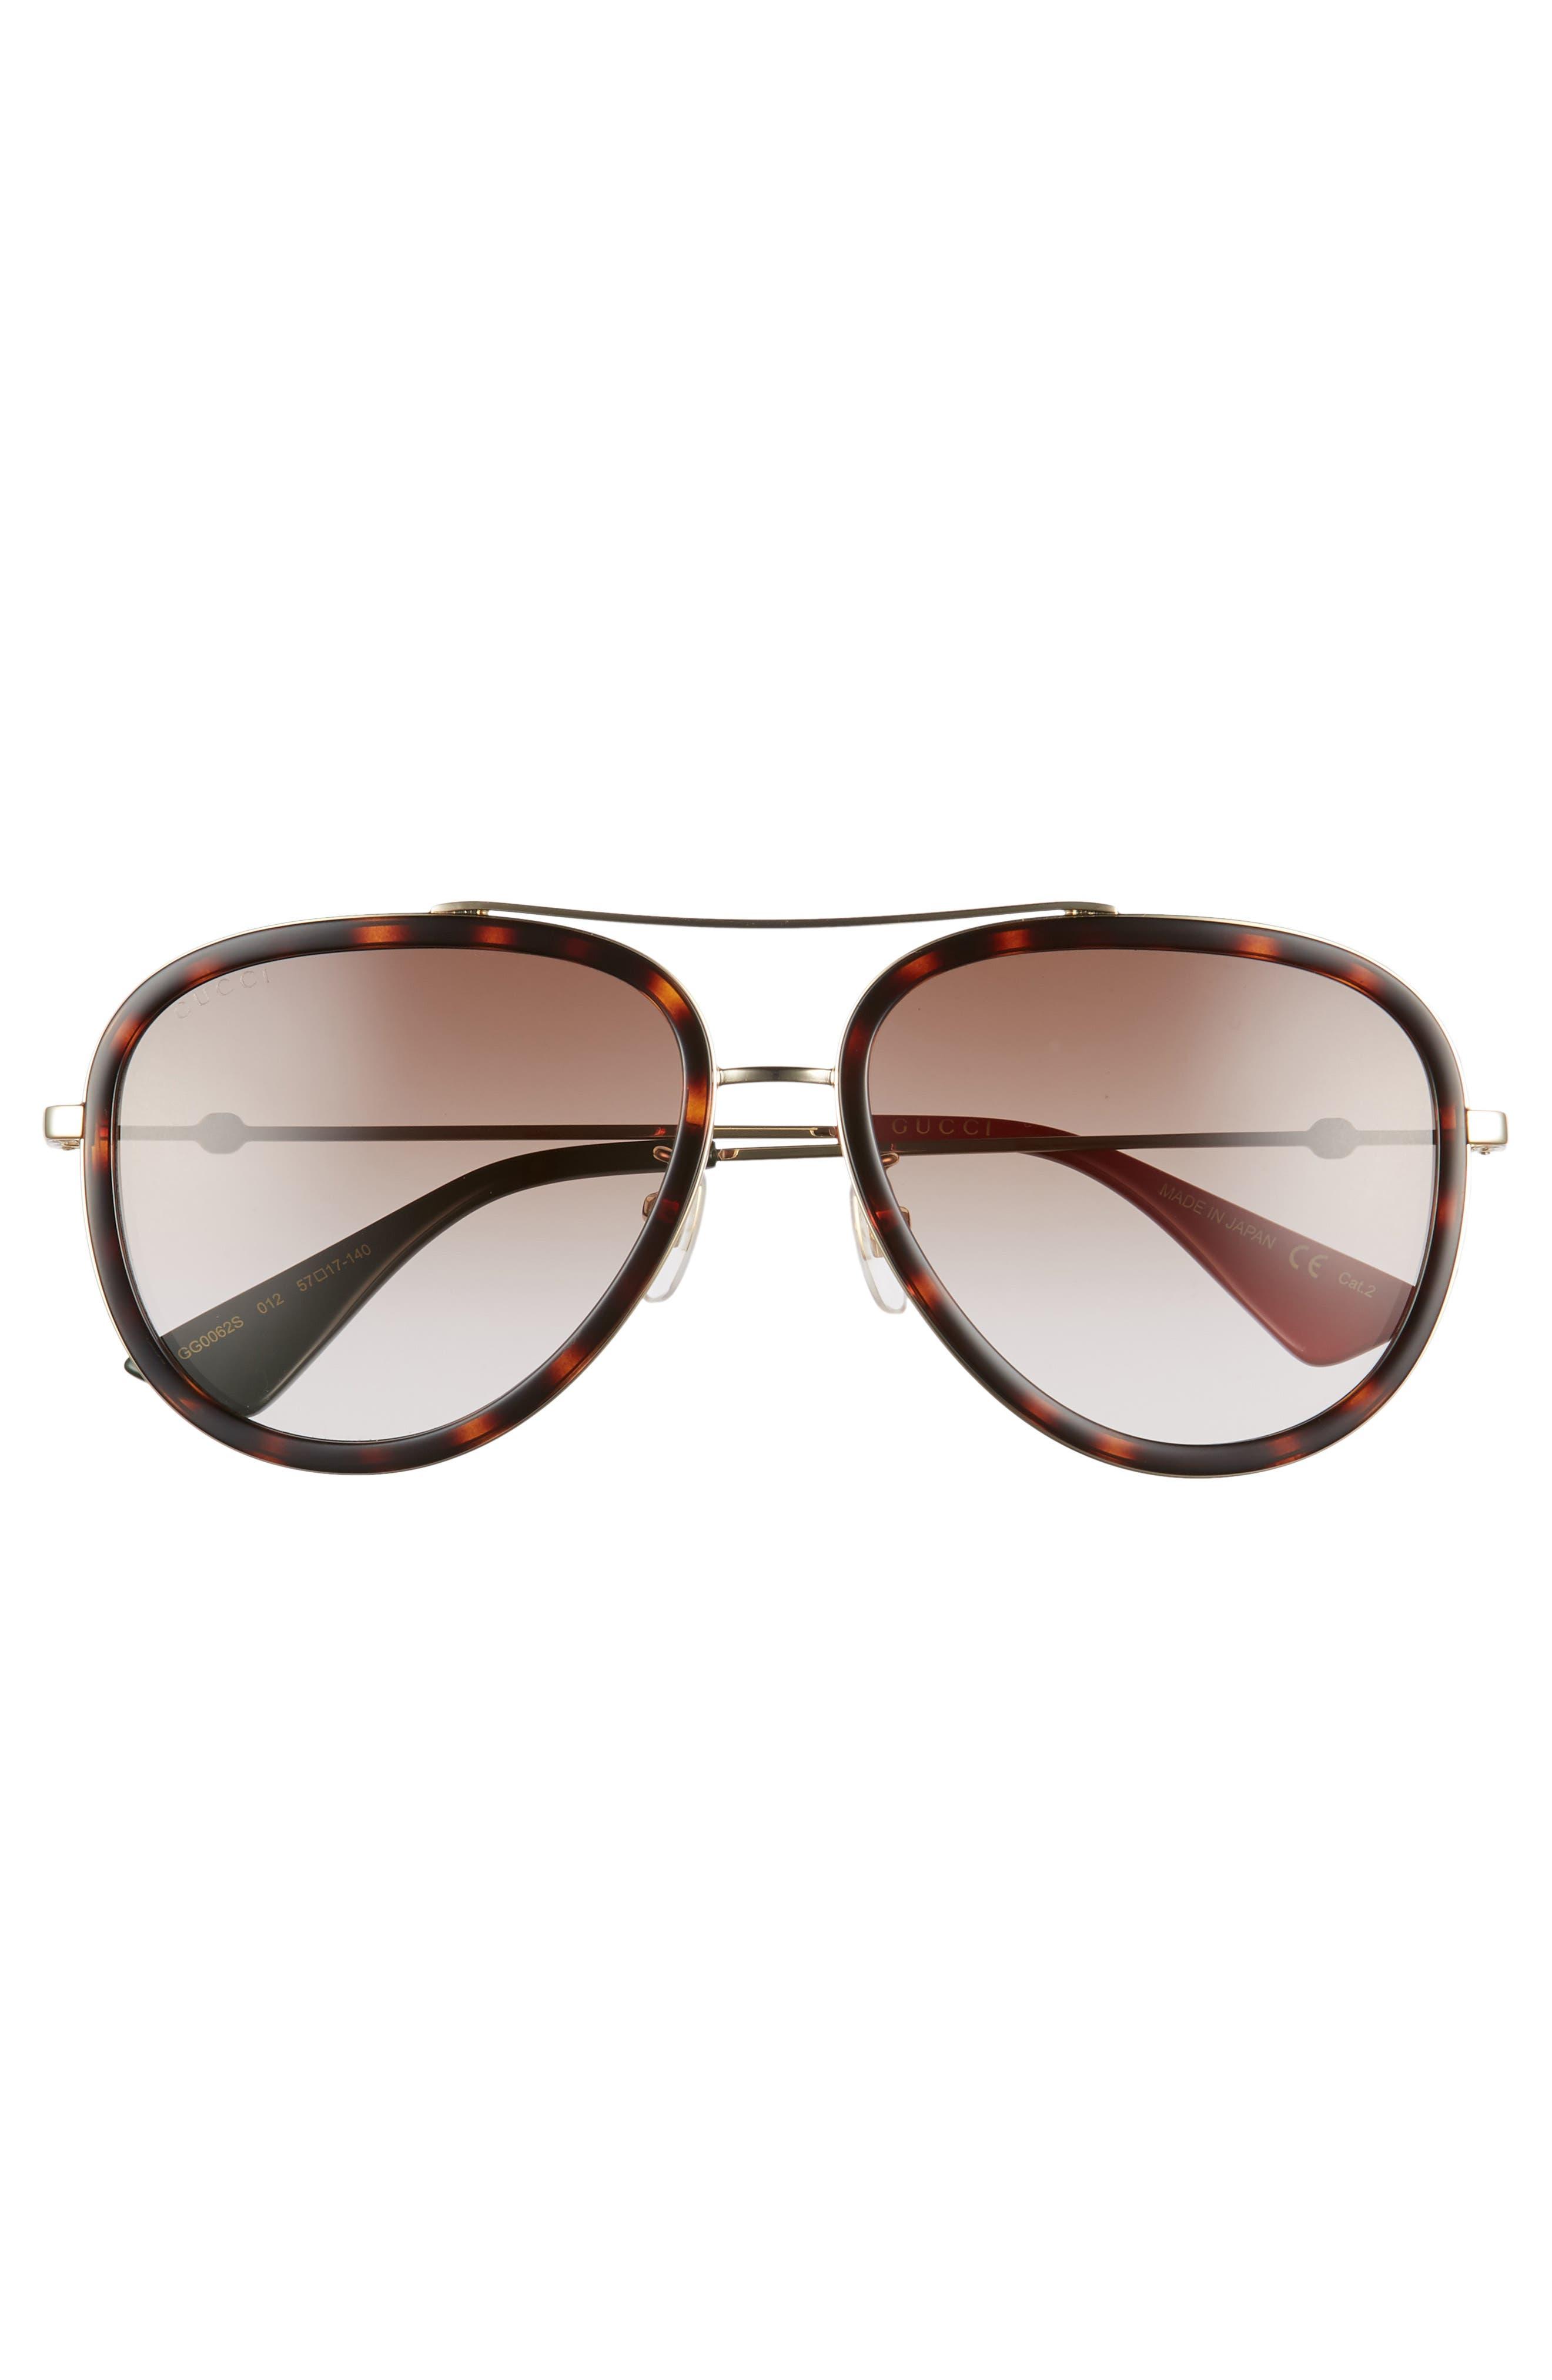 57mm Aviator Sunglasses,                             Alternate thumbnail 3, color,                             GOLD/ RED/ GREEN